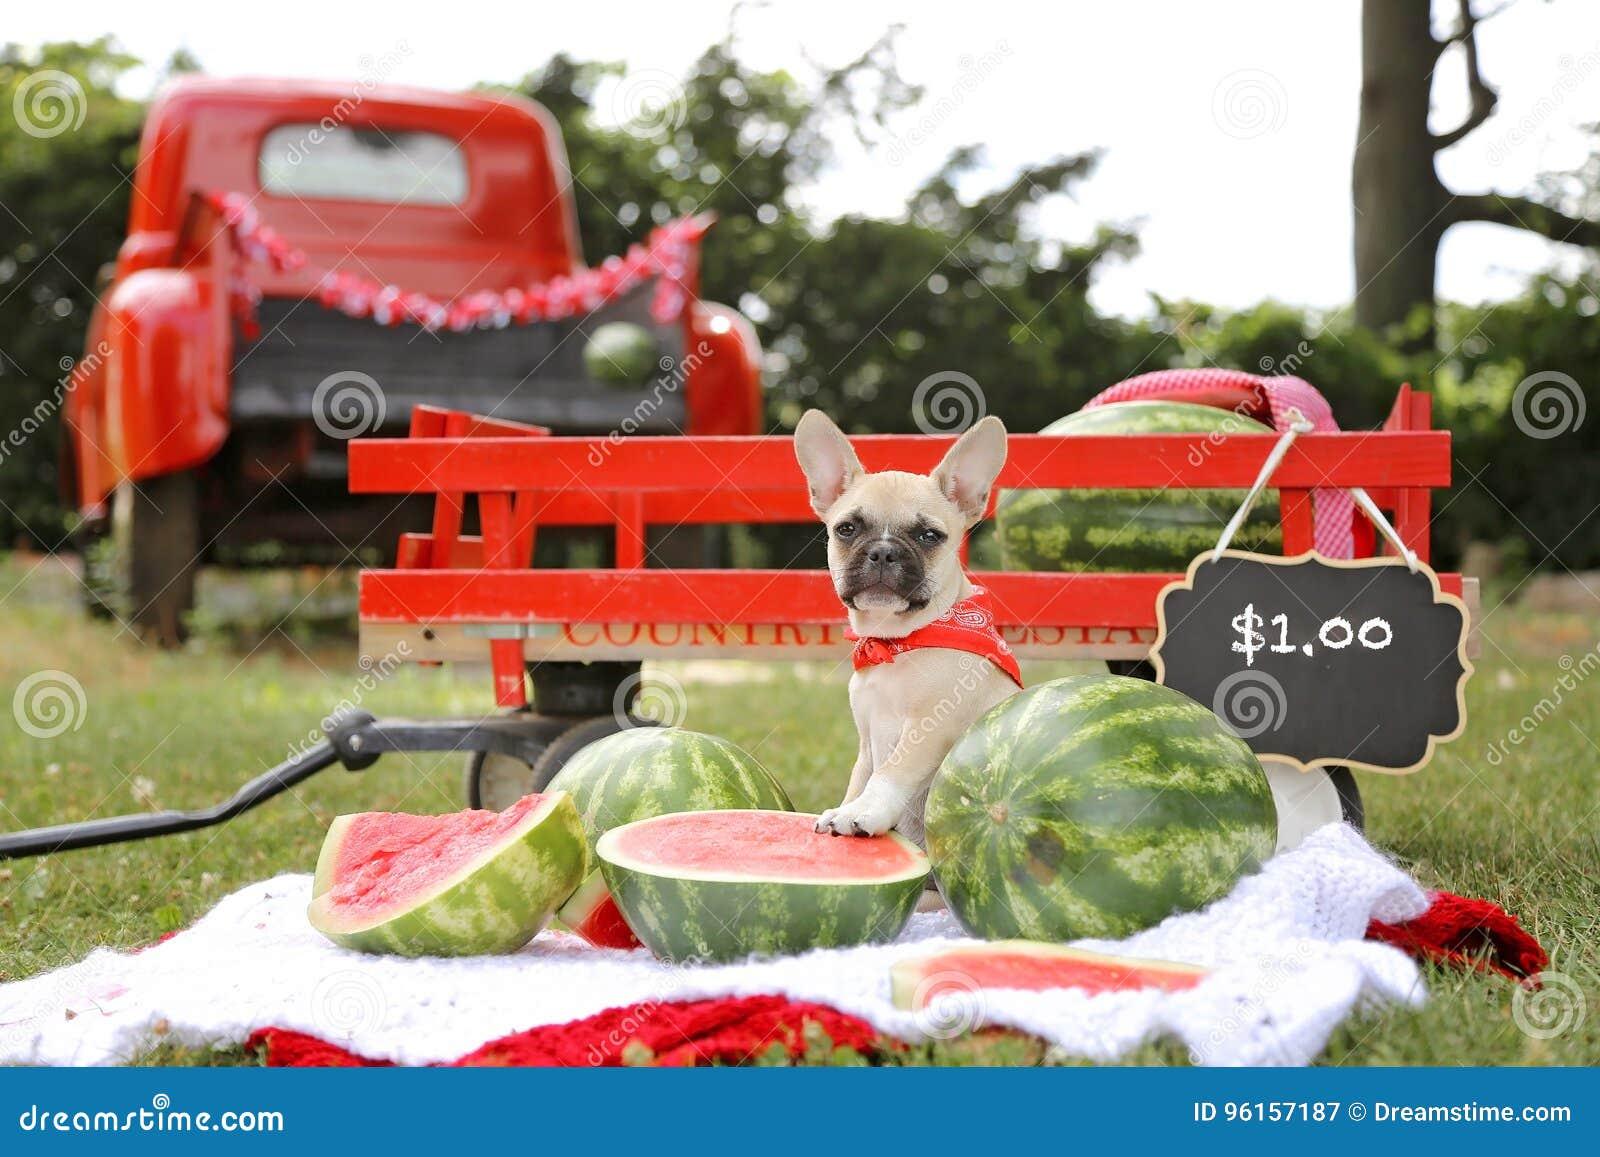 French bulldog puppy selling watermelon